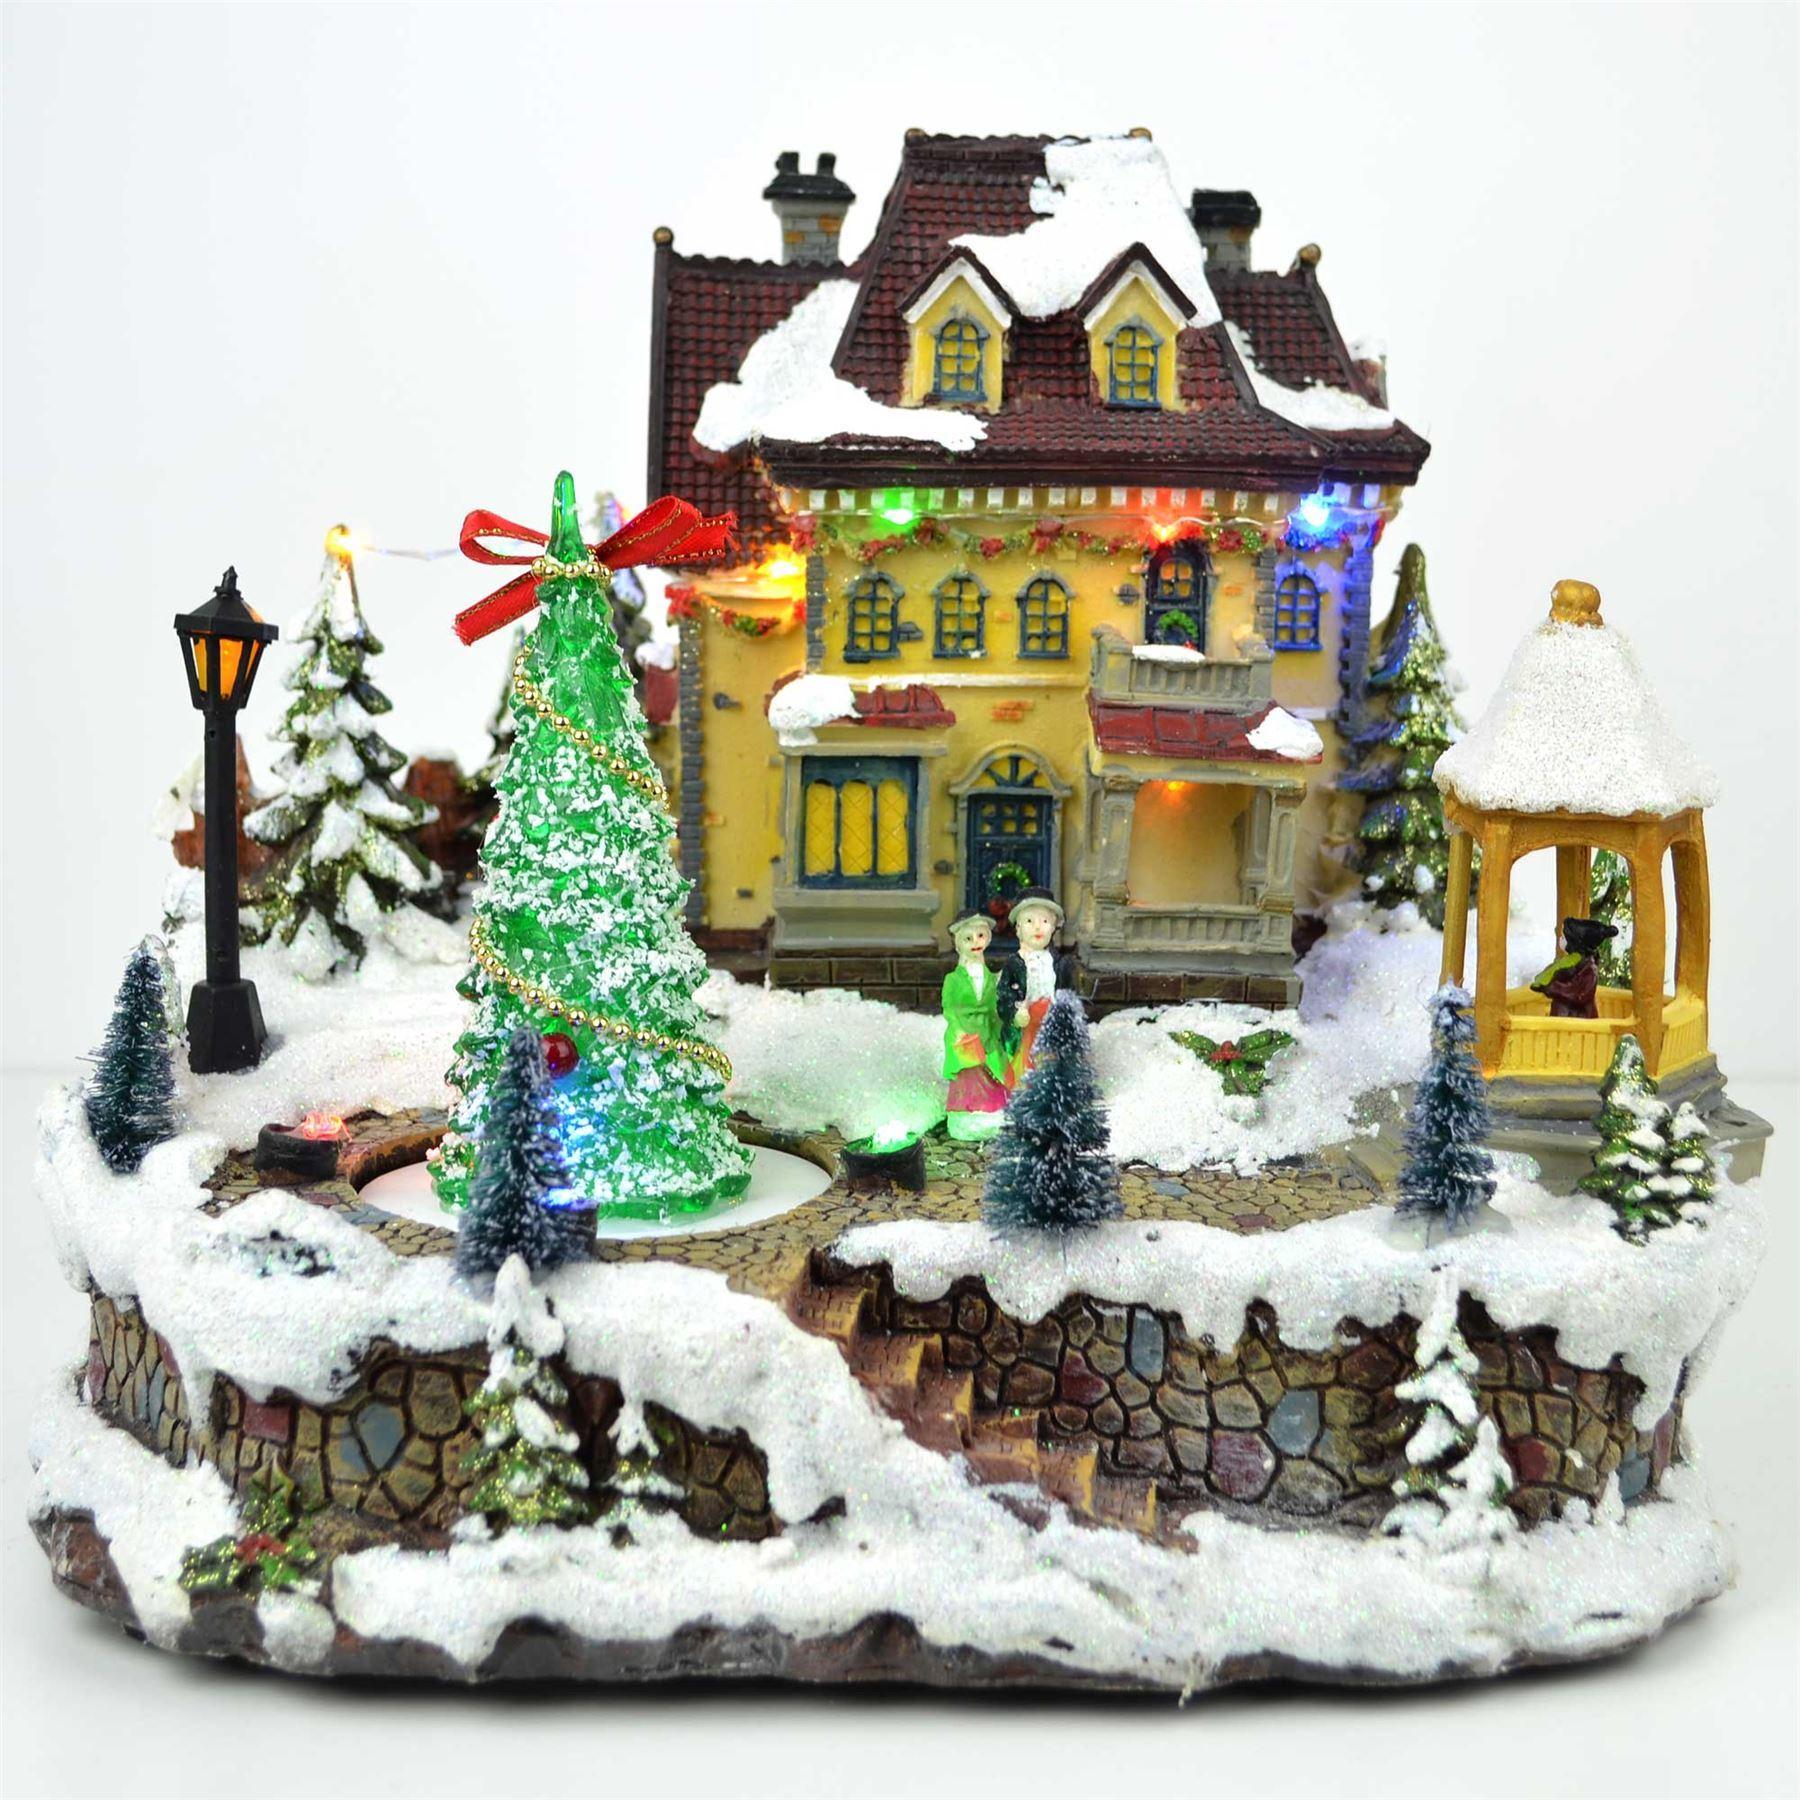 Shatchi Christmas Nativity Scene Set Home Decor